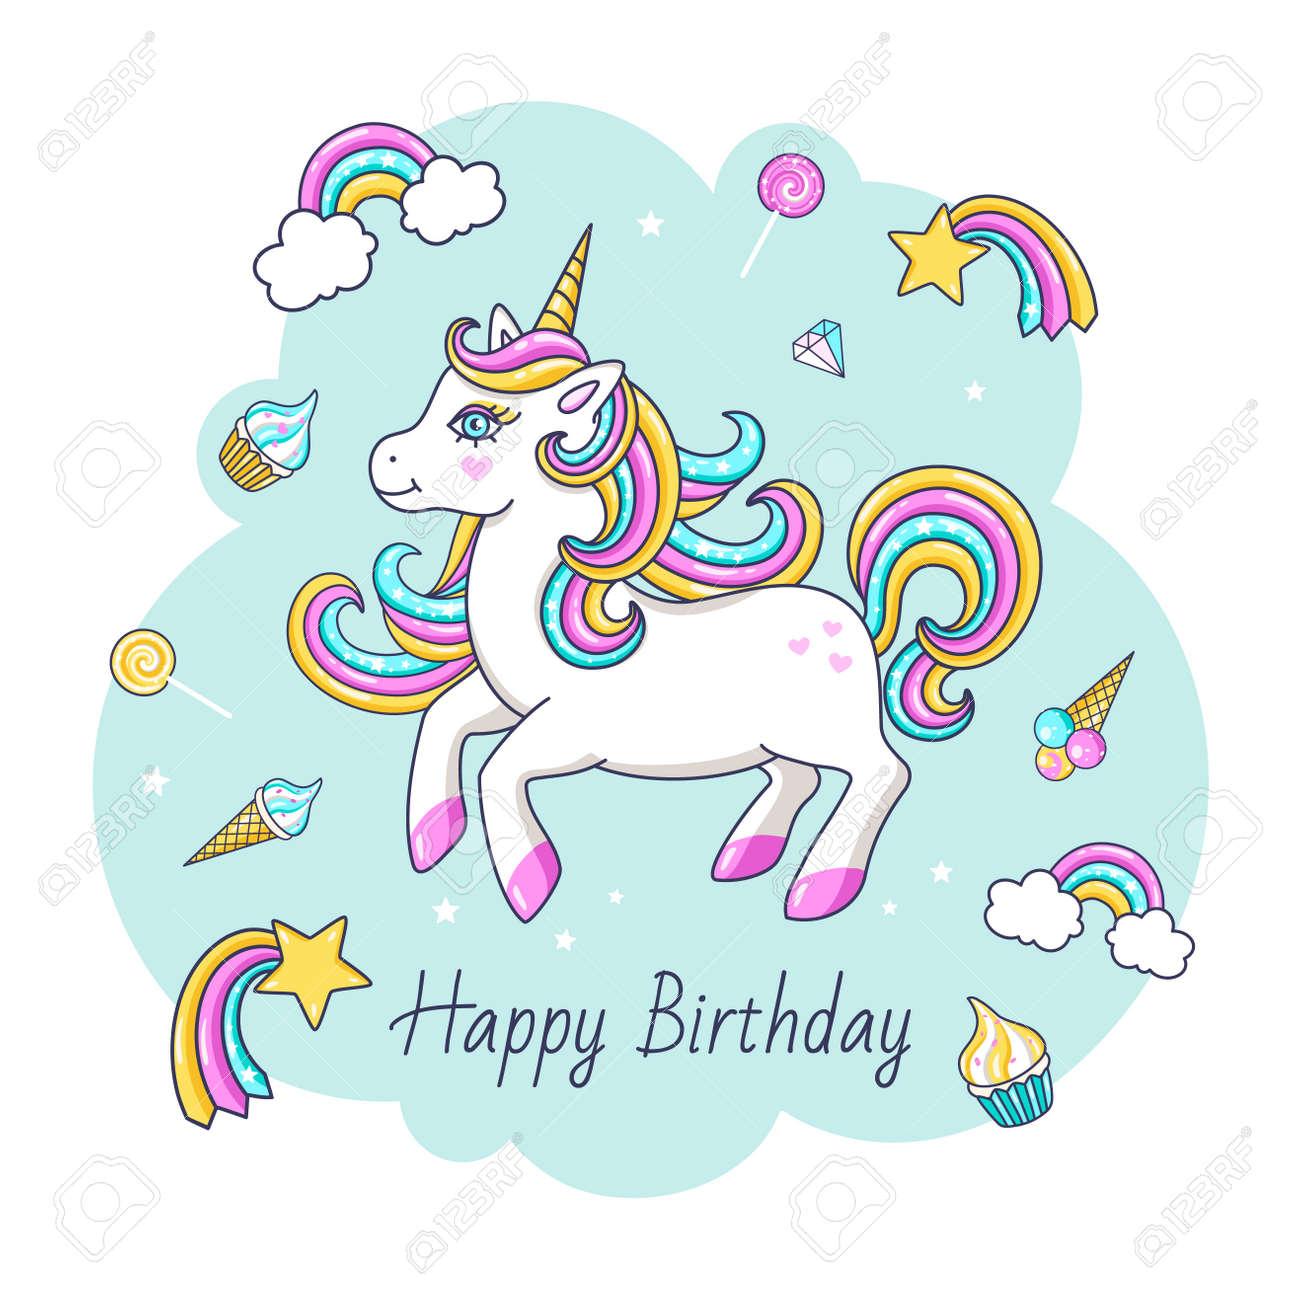 Happy Birthday Card With Cute Unicorn Vector Illustration Royalty